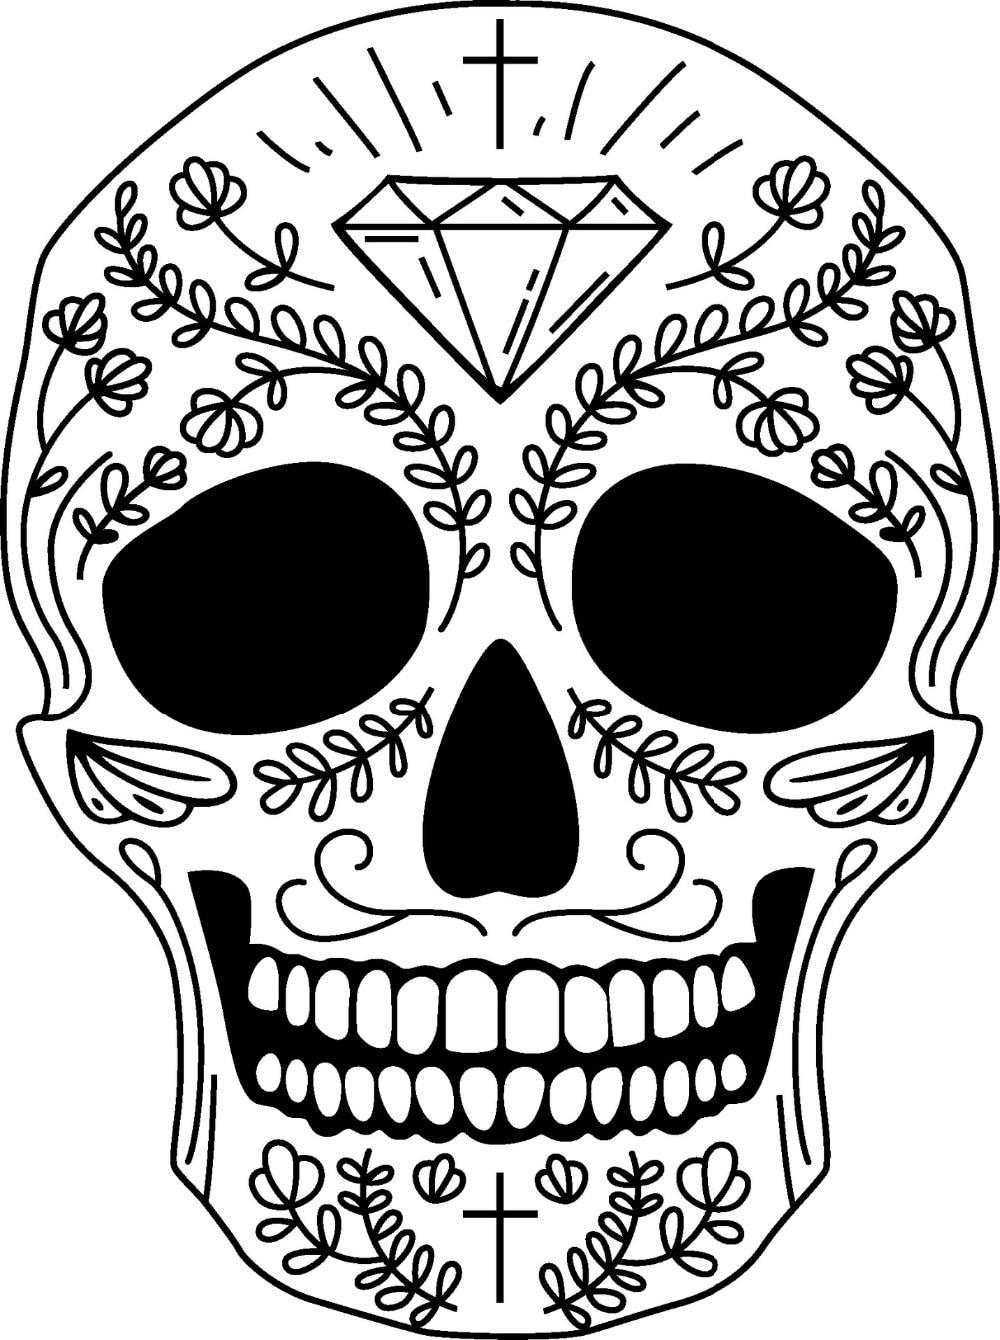 AWOO Skull Wall Sticker Skull Punk Rock Creative Removable